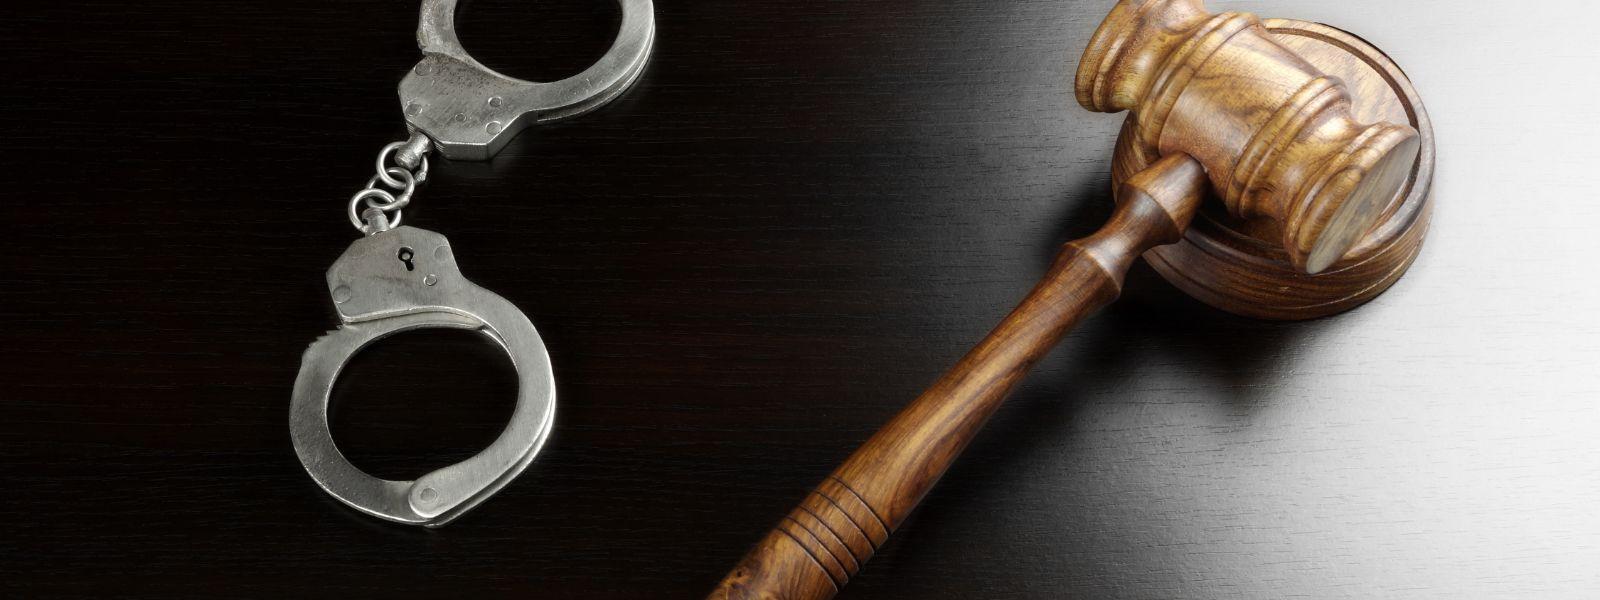 Cochran Texas | Criminal Defense Attorneys in Texas - The Cochran Firm - Texas Personal Injury & Criminal Defense Lawyers